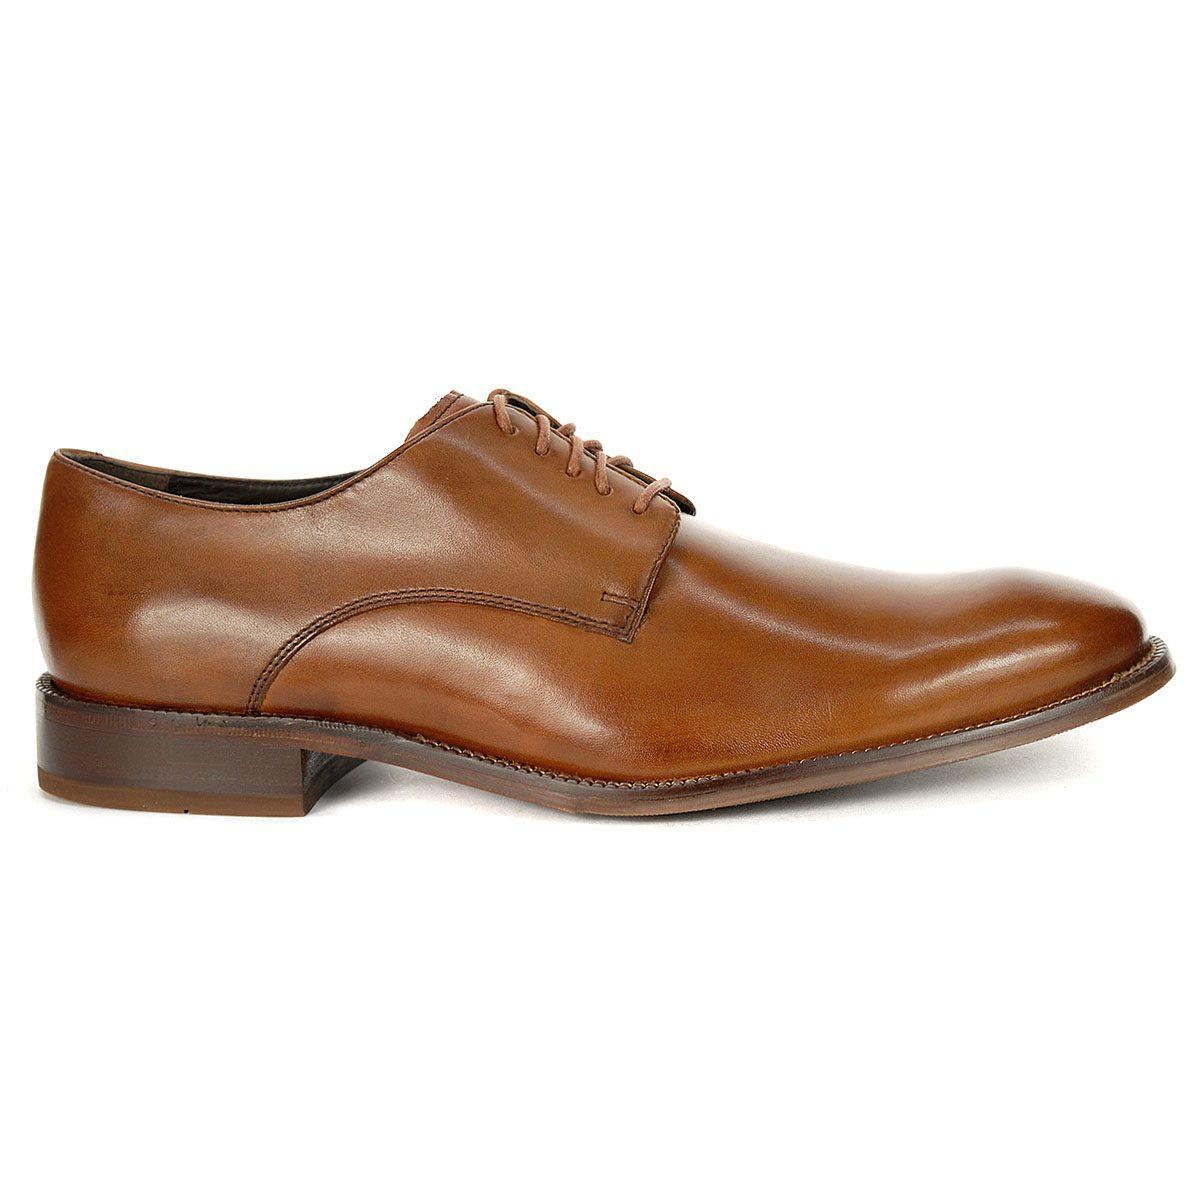 Cole Haan Men's Williams Plain Toe